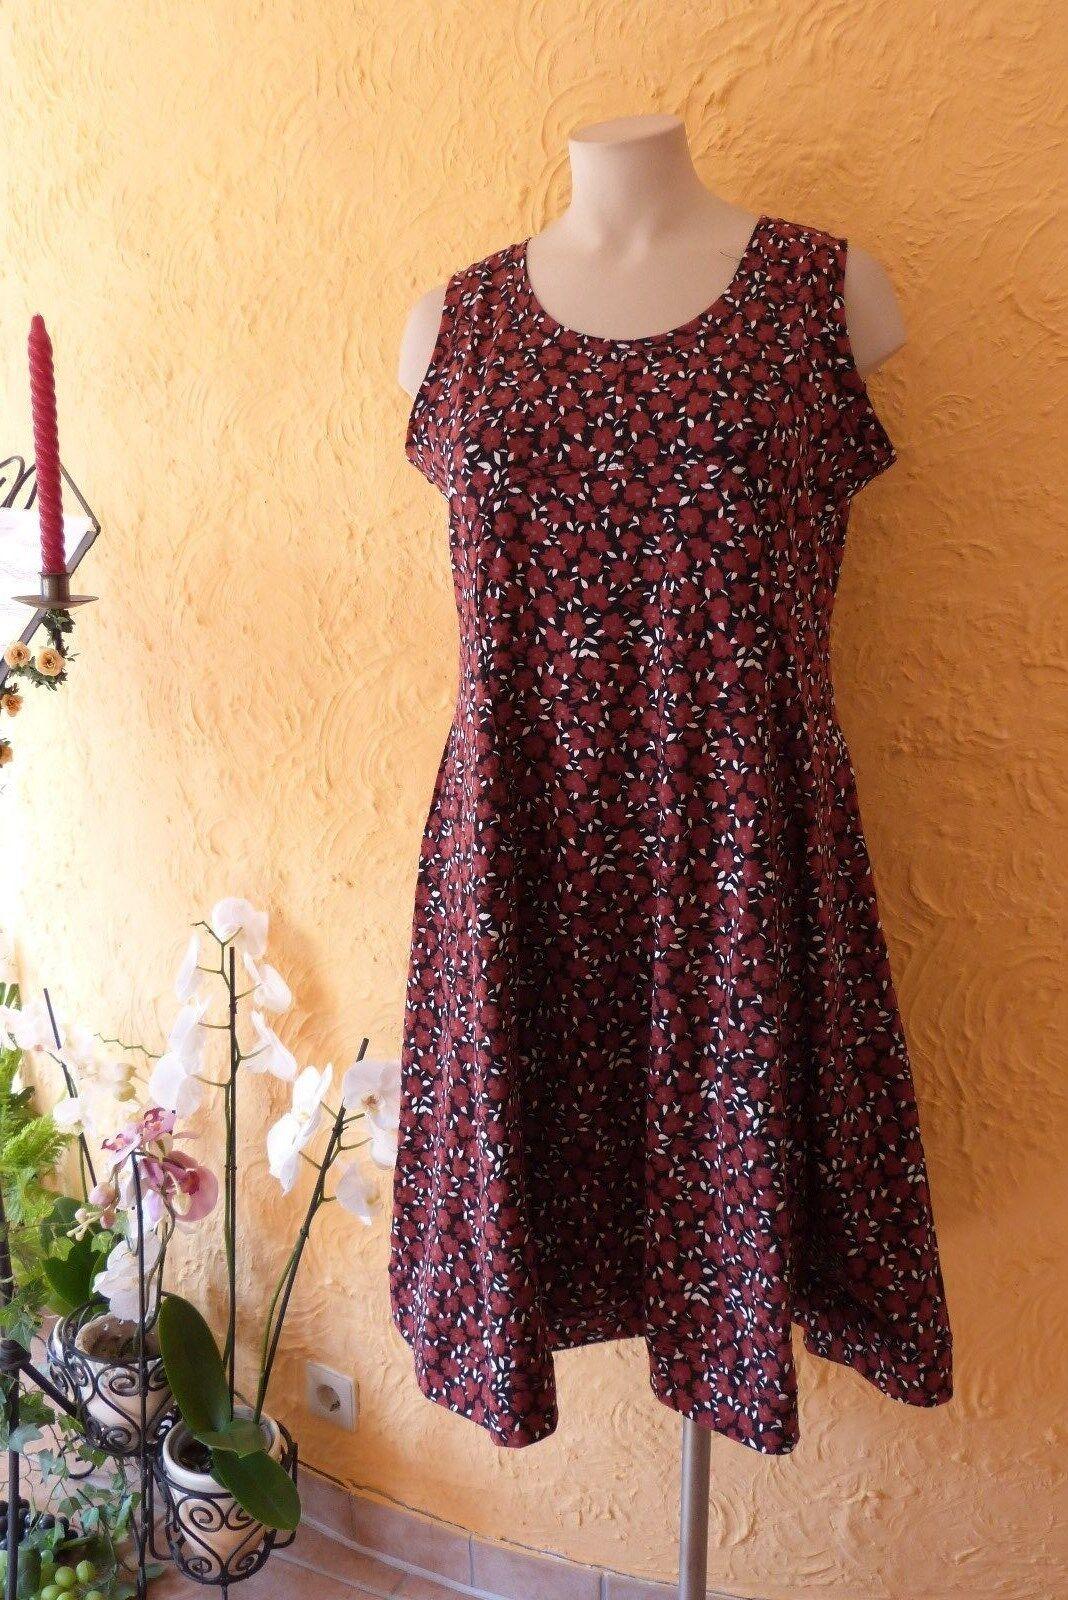 BORIS INDUSTRIES Empire Kleid 46 (4) NEU floral MEGA A-Form Baumwolle LAGENLOOK